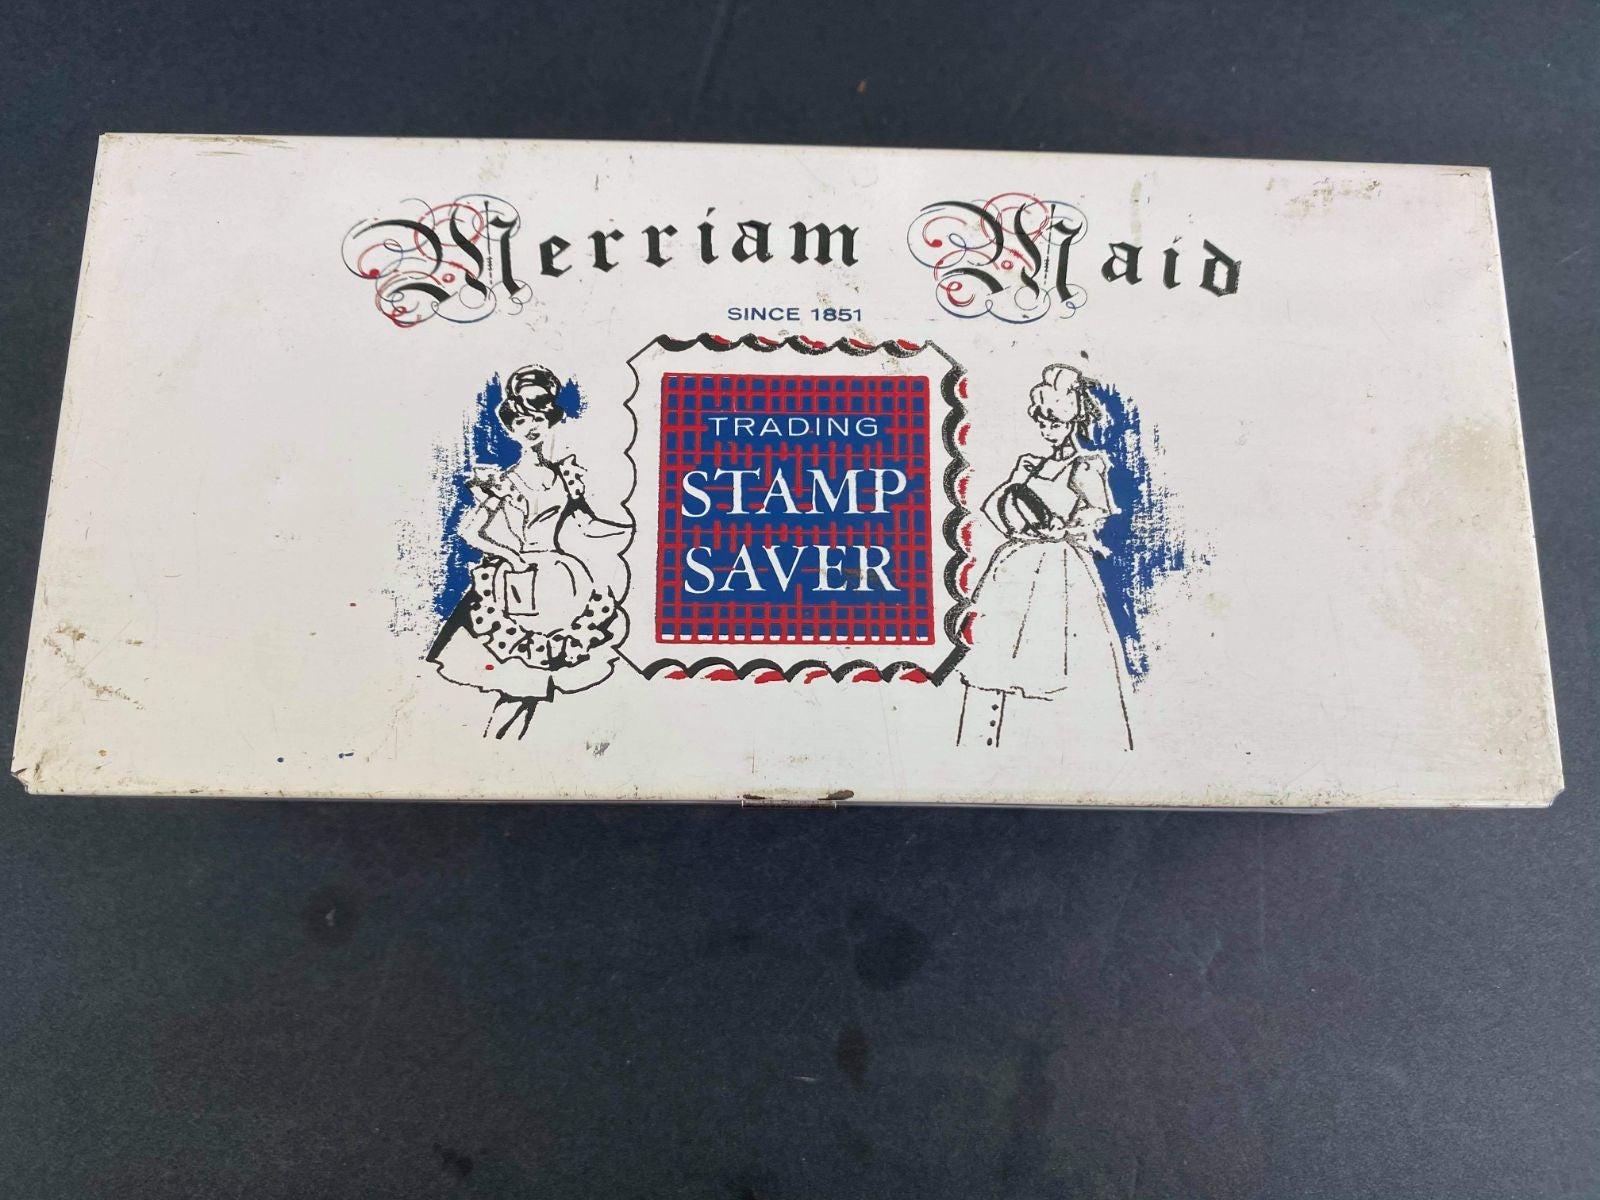 Merriam Maid Trading Stamp Saver Box